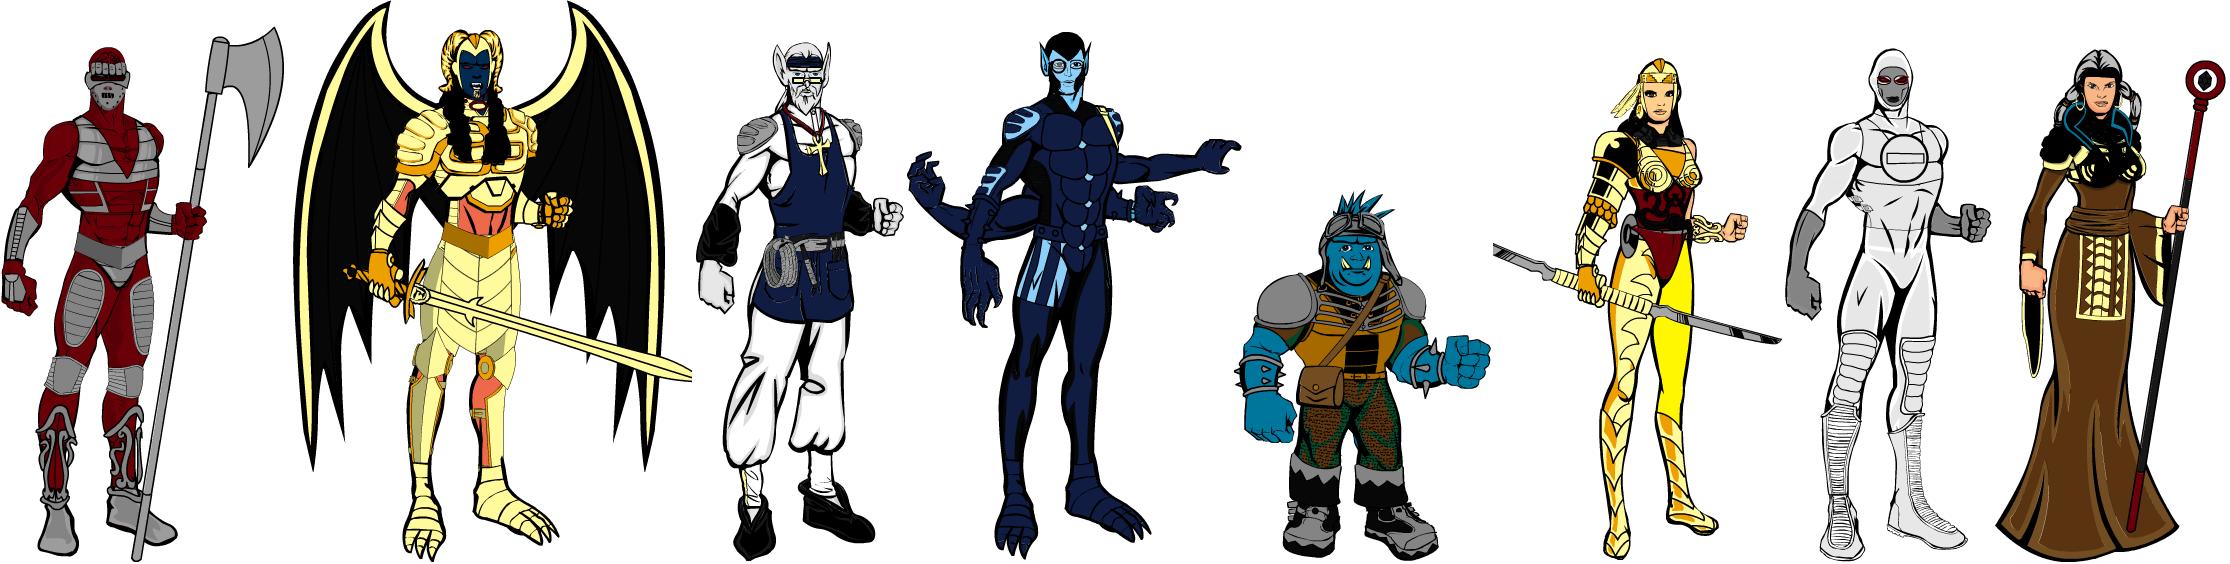 evil space aliens mmpr02 by captaindutch on deviantart